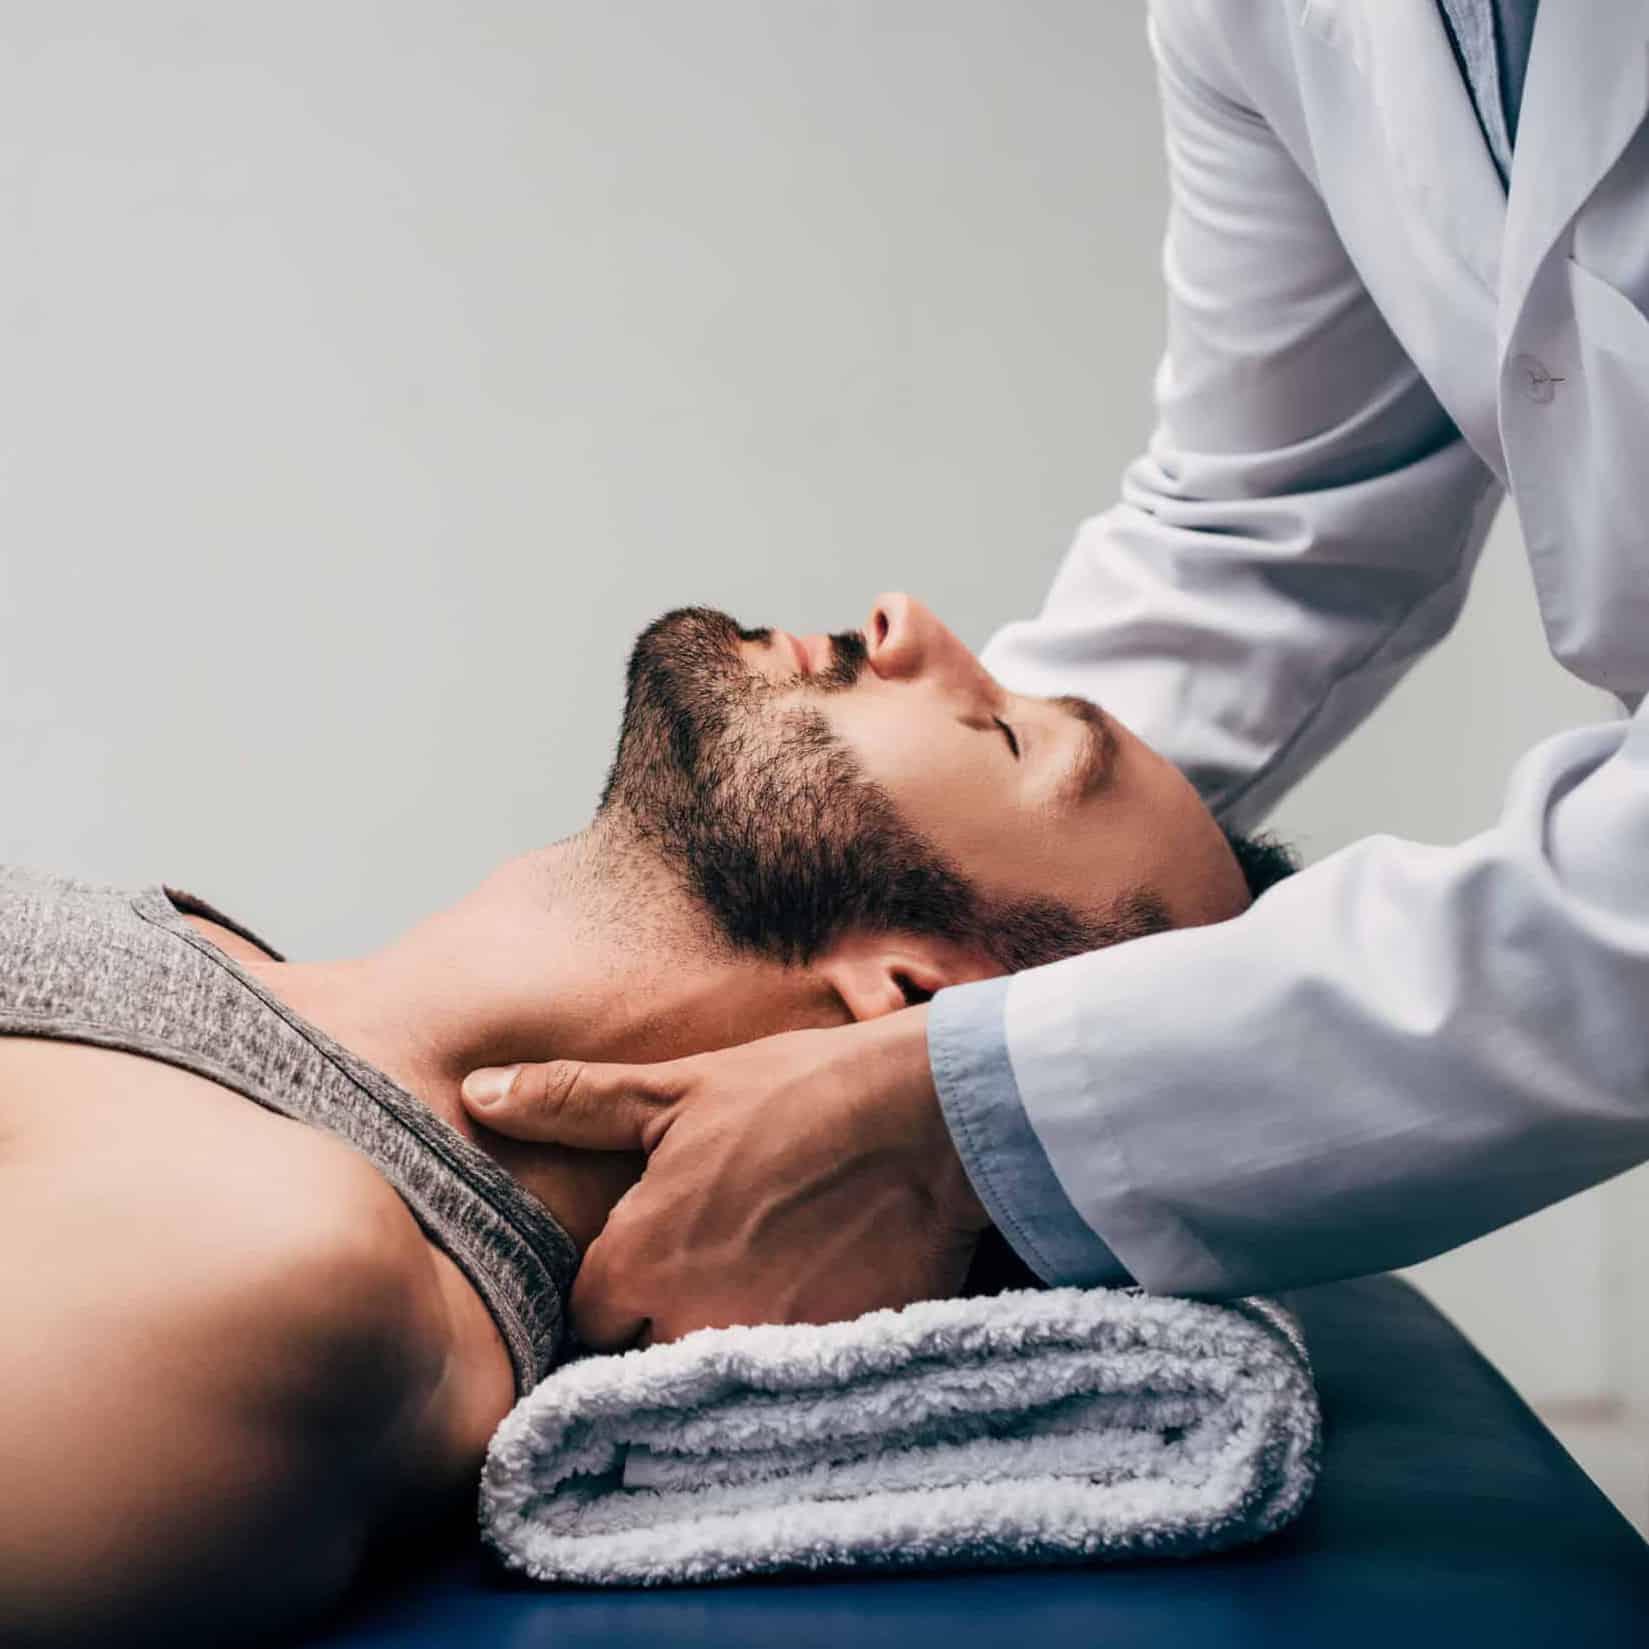 Walk-In Chiropractor Adjusting Client